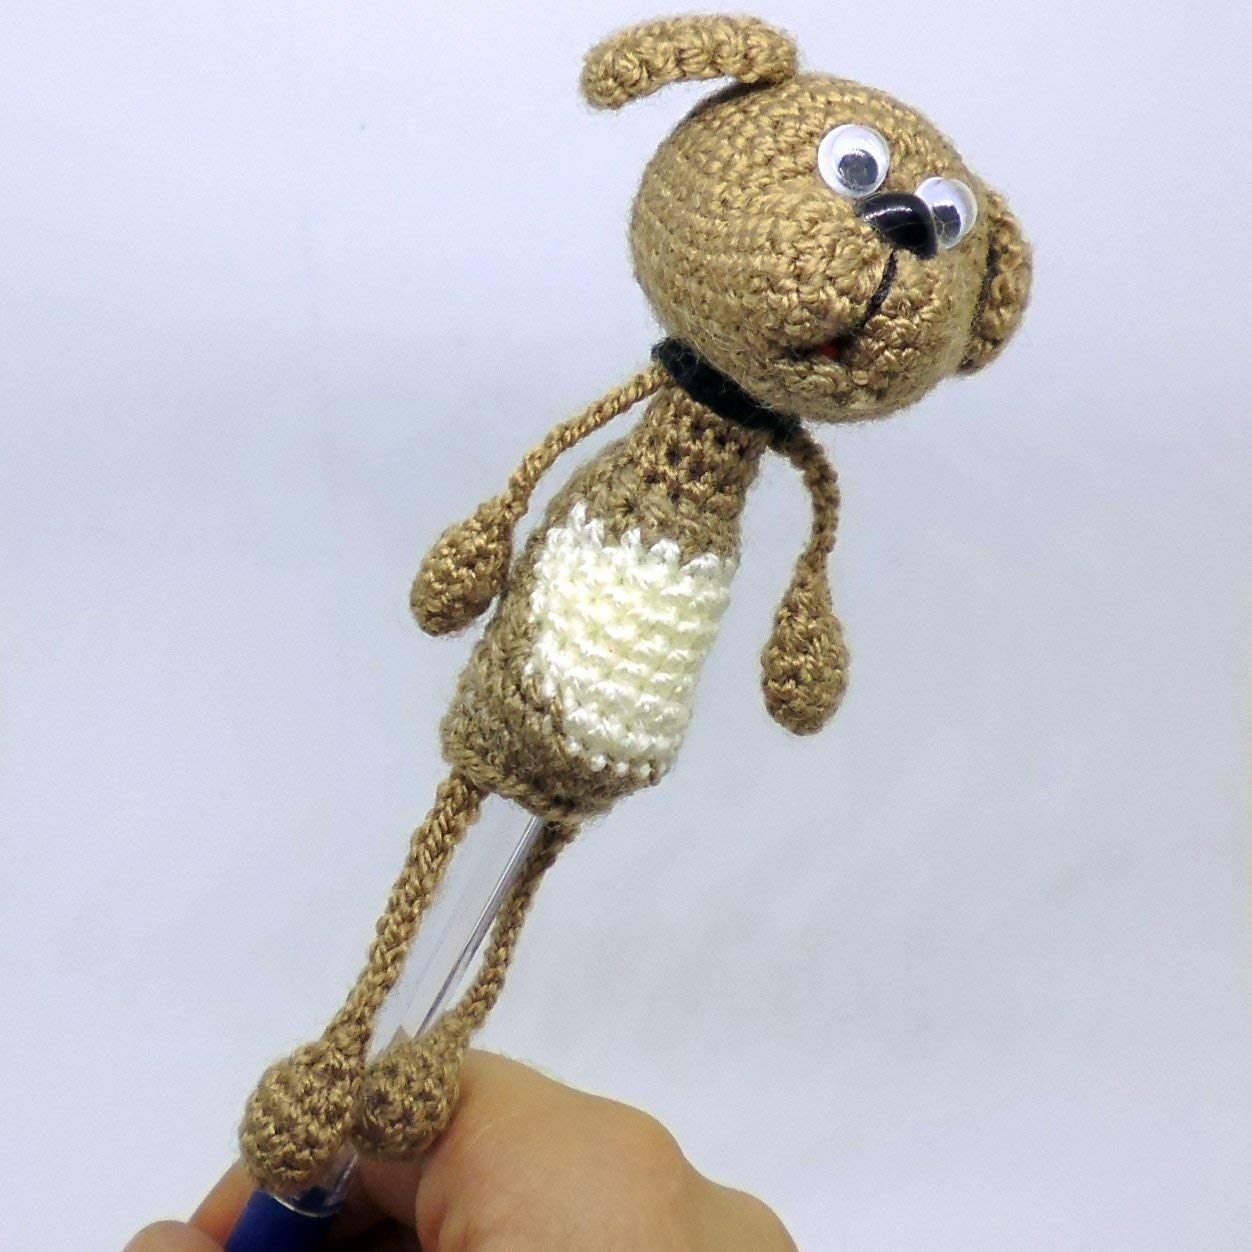 dog Pen Topper Amigurumi pencil topper Crocheted animal pencil cozy Animal Pen Topper crocheted pencil head the cap on the pencil